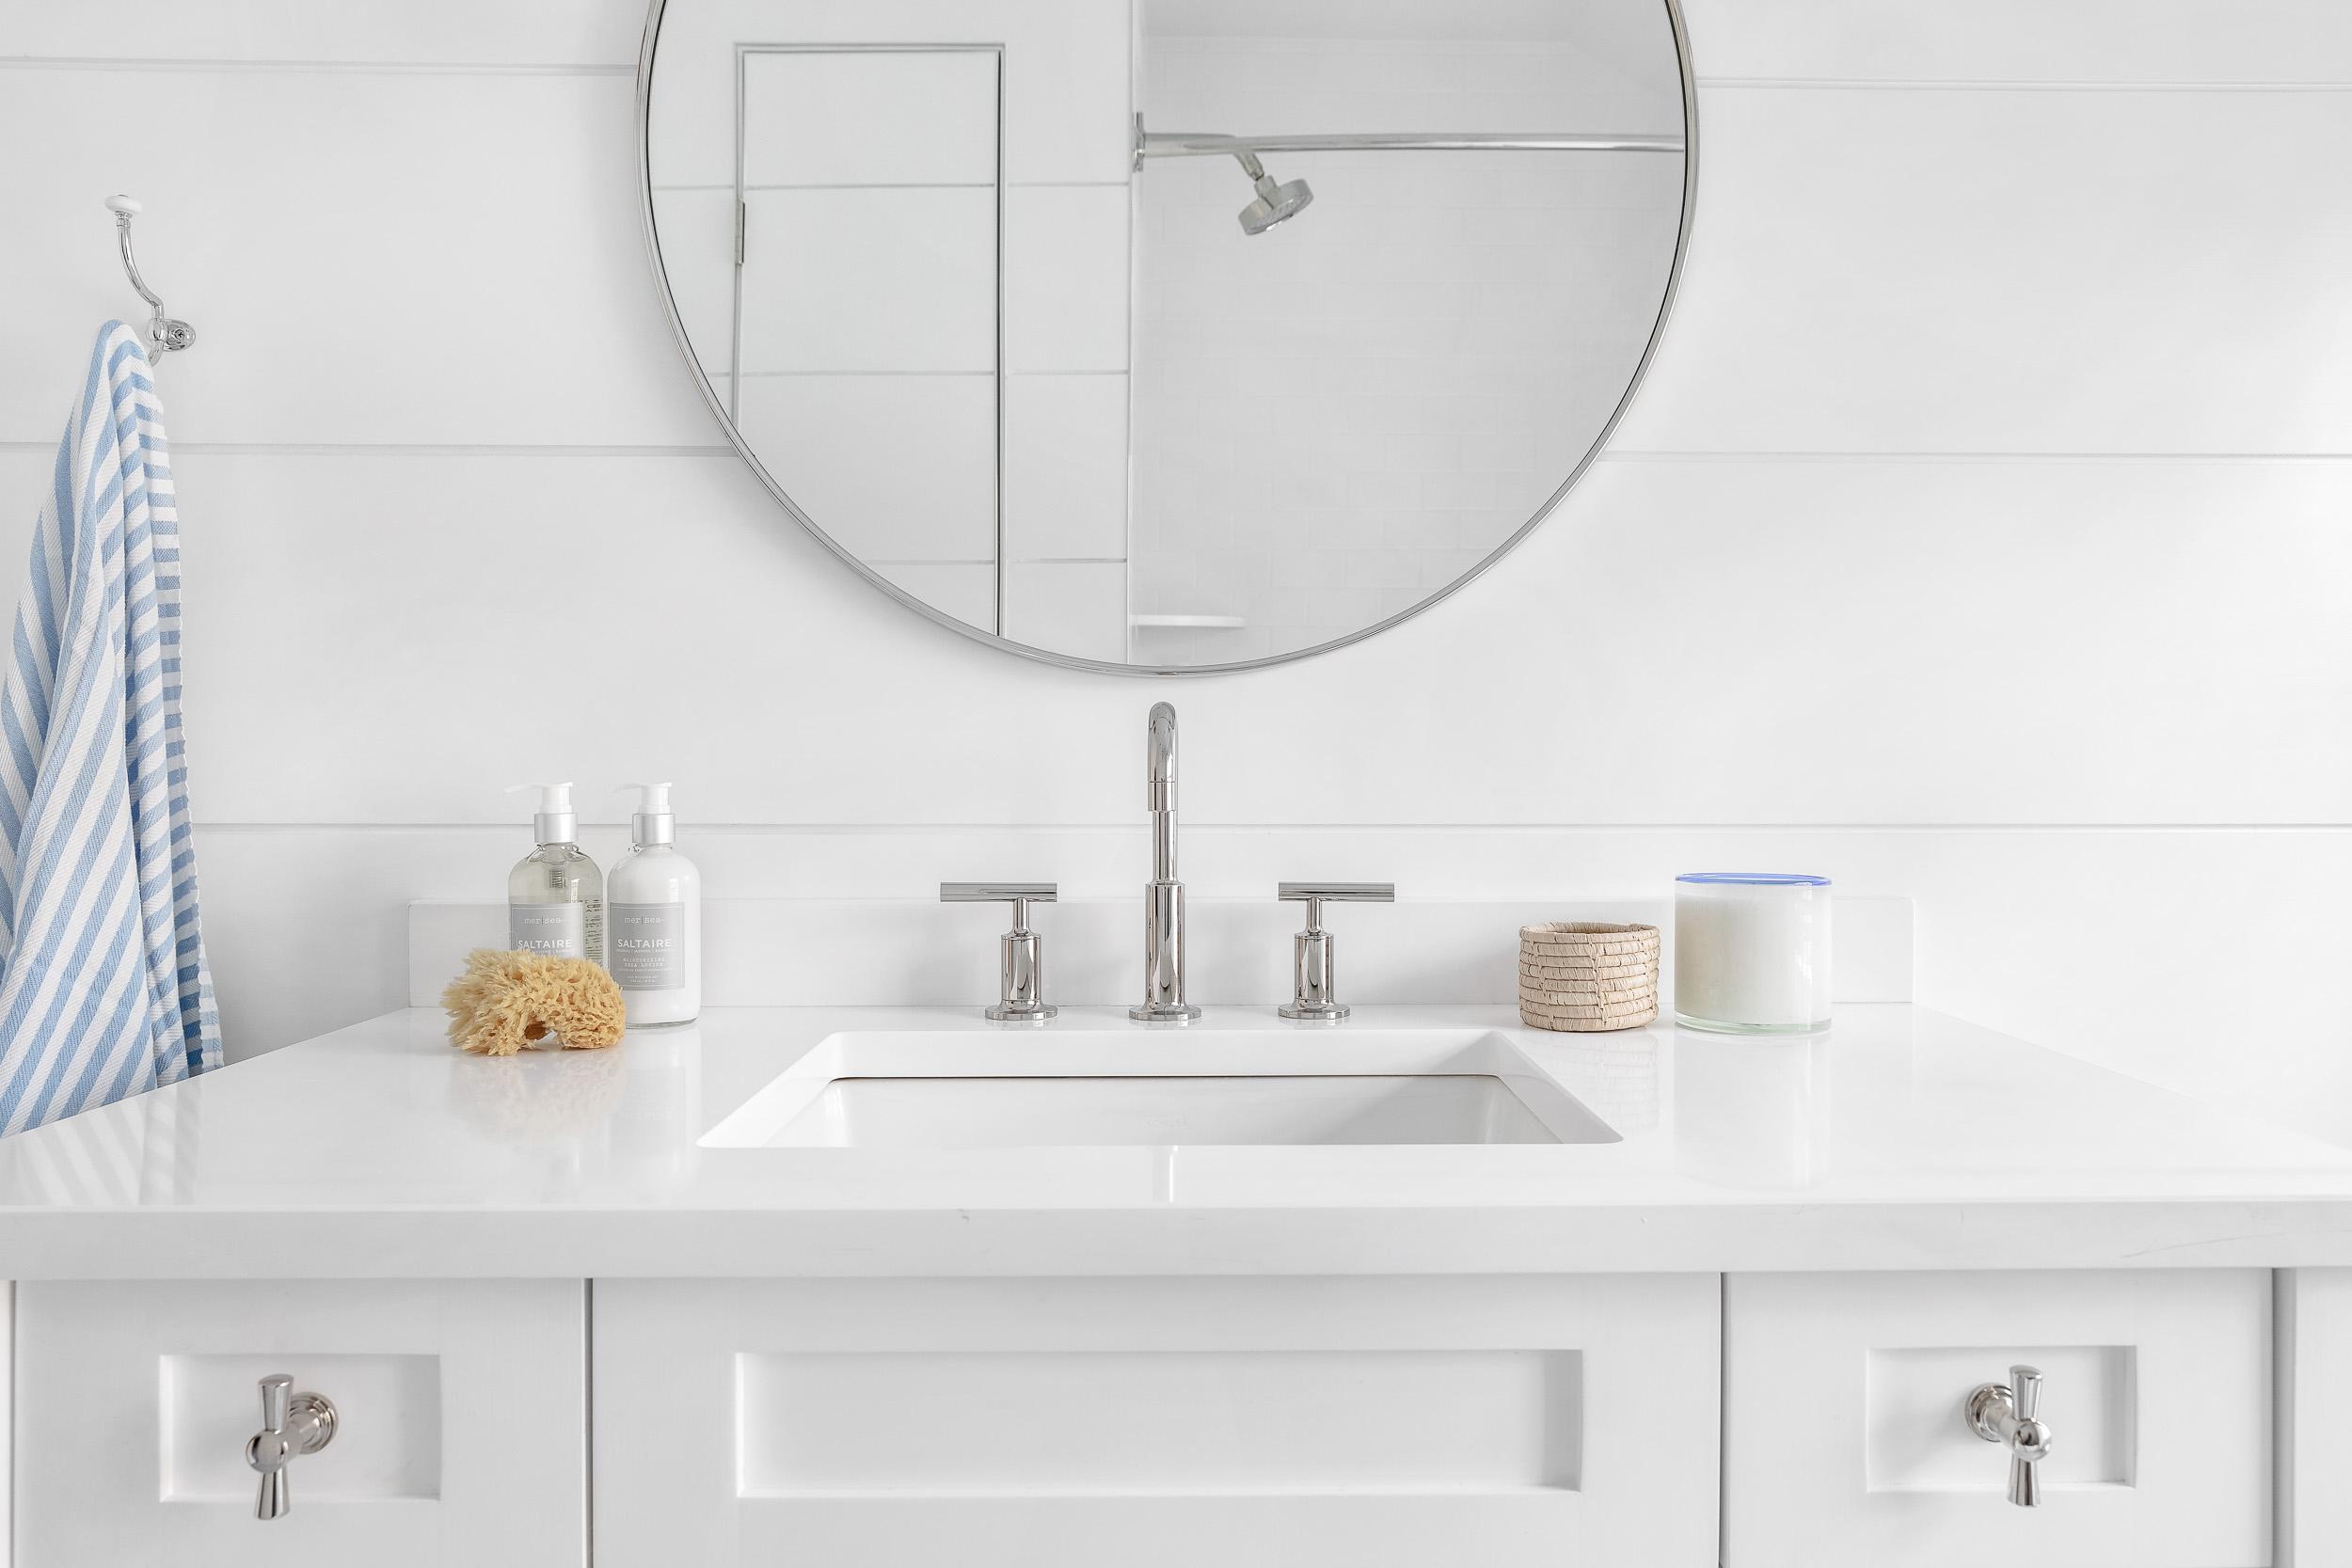 parker and parker design-interior design photography-darien ct-white bathroom-vanity.jpg